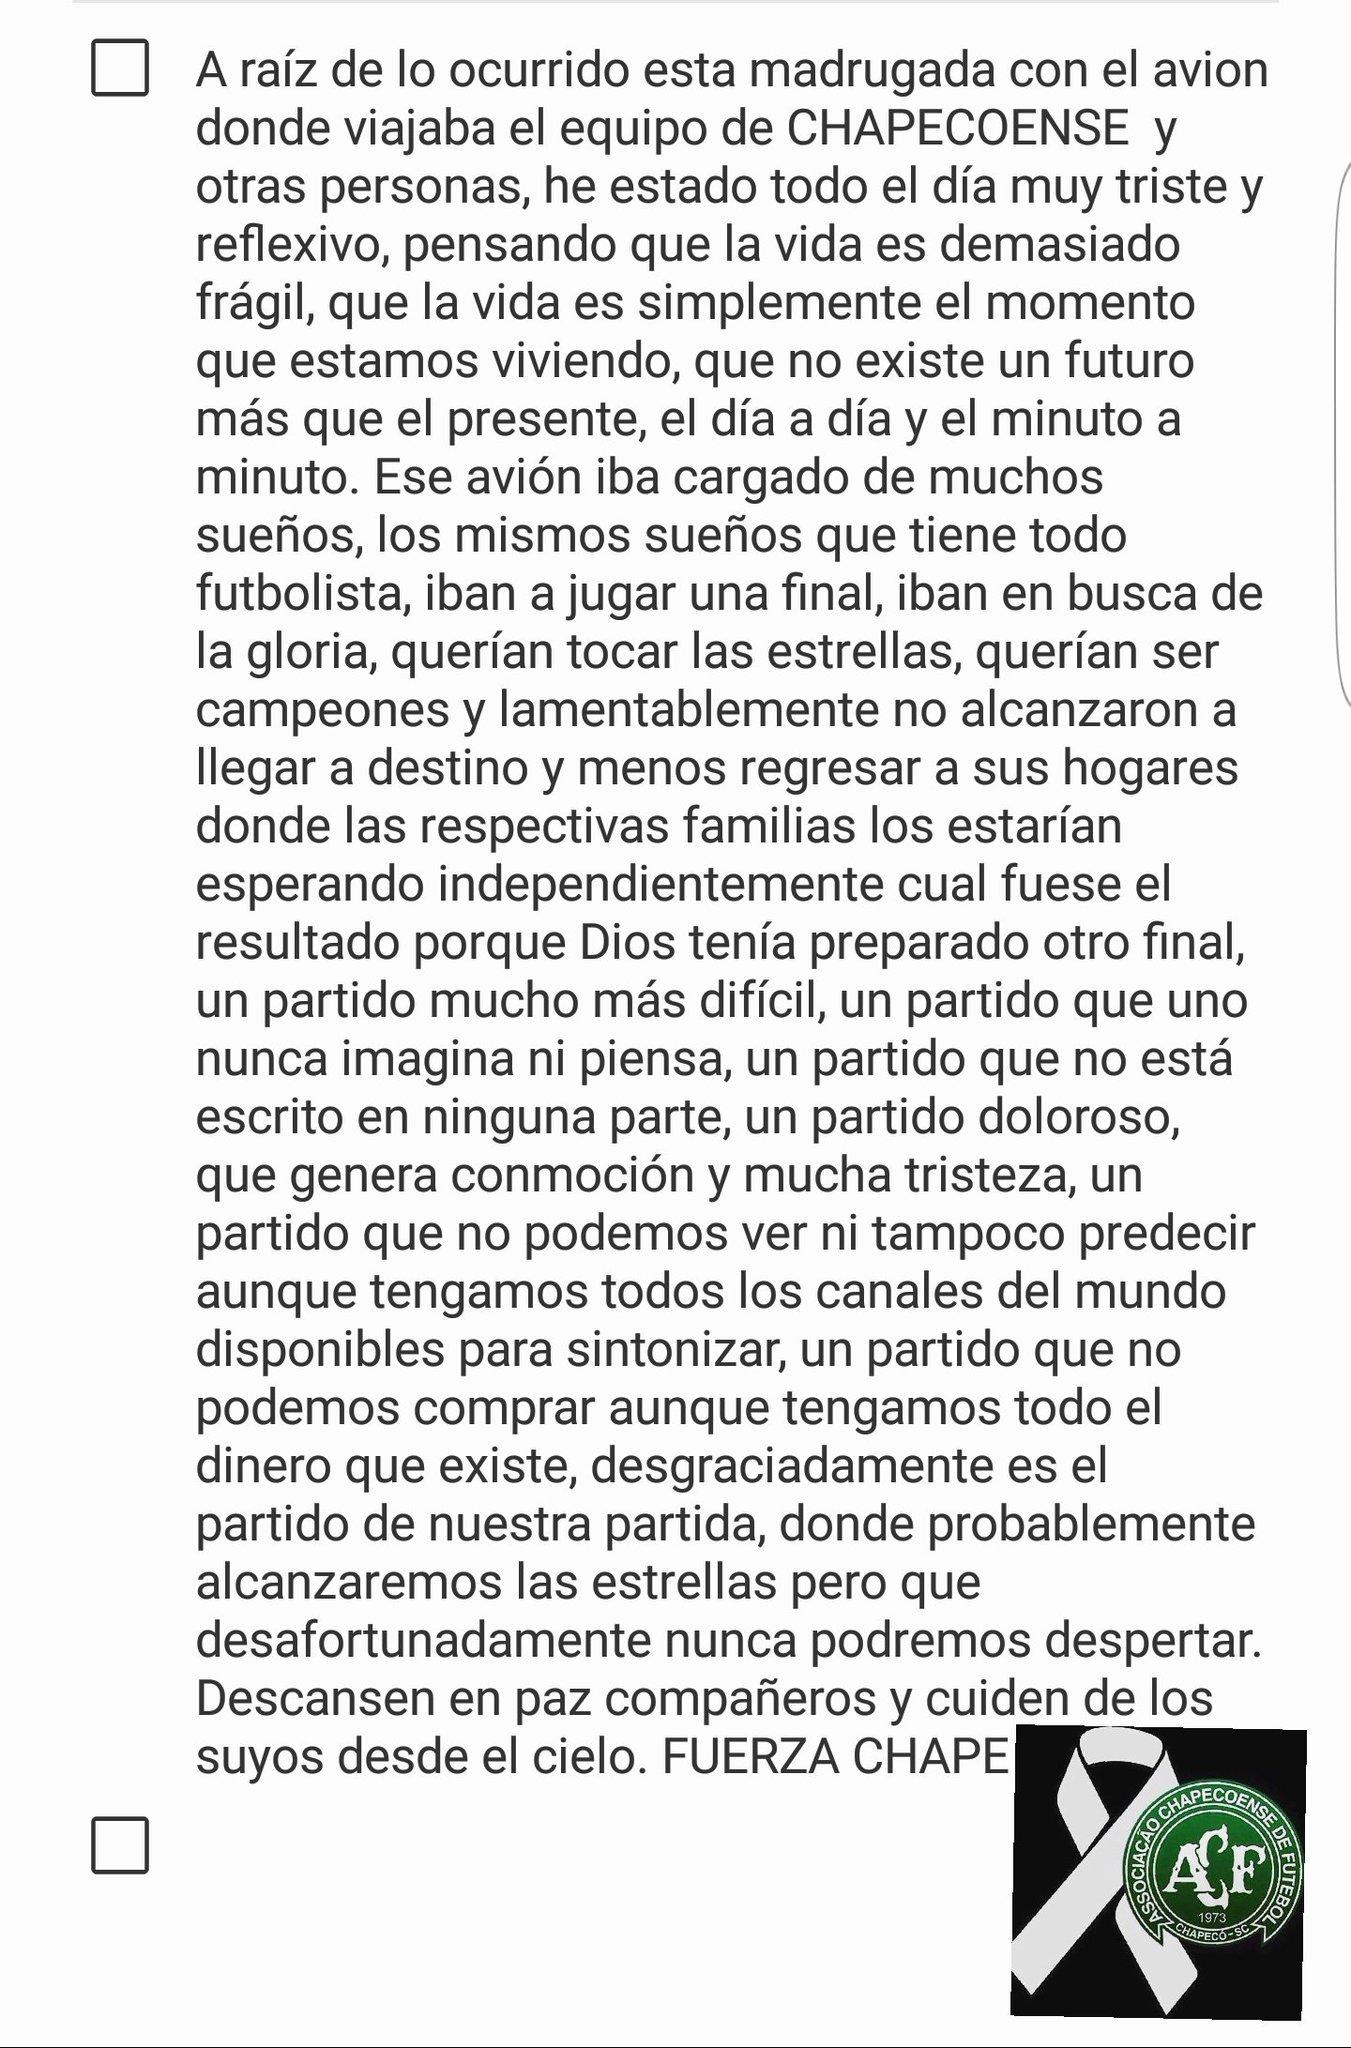 Carta_Marcelo_Diaz_Chapecoense